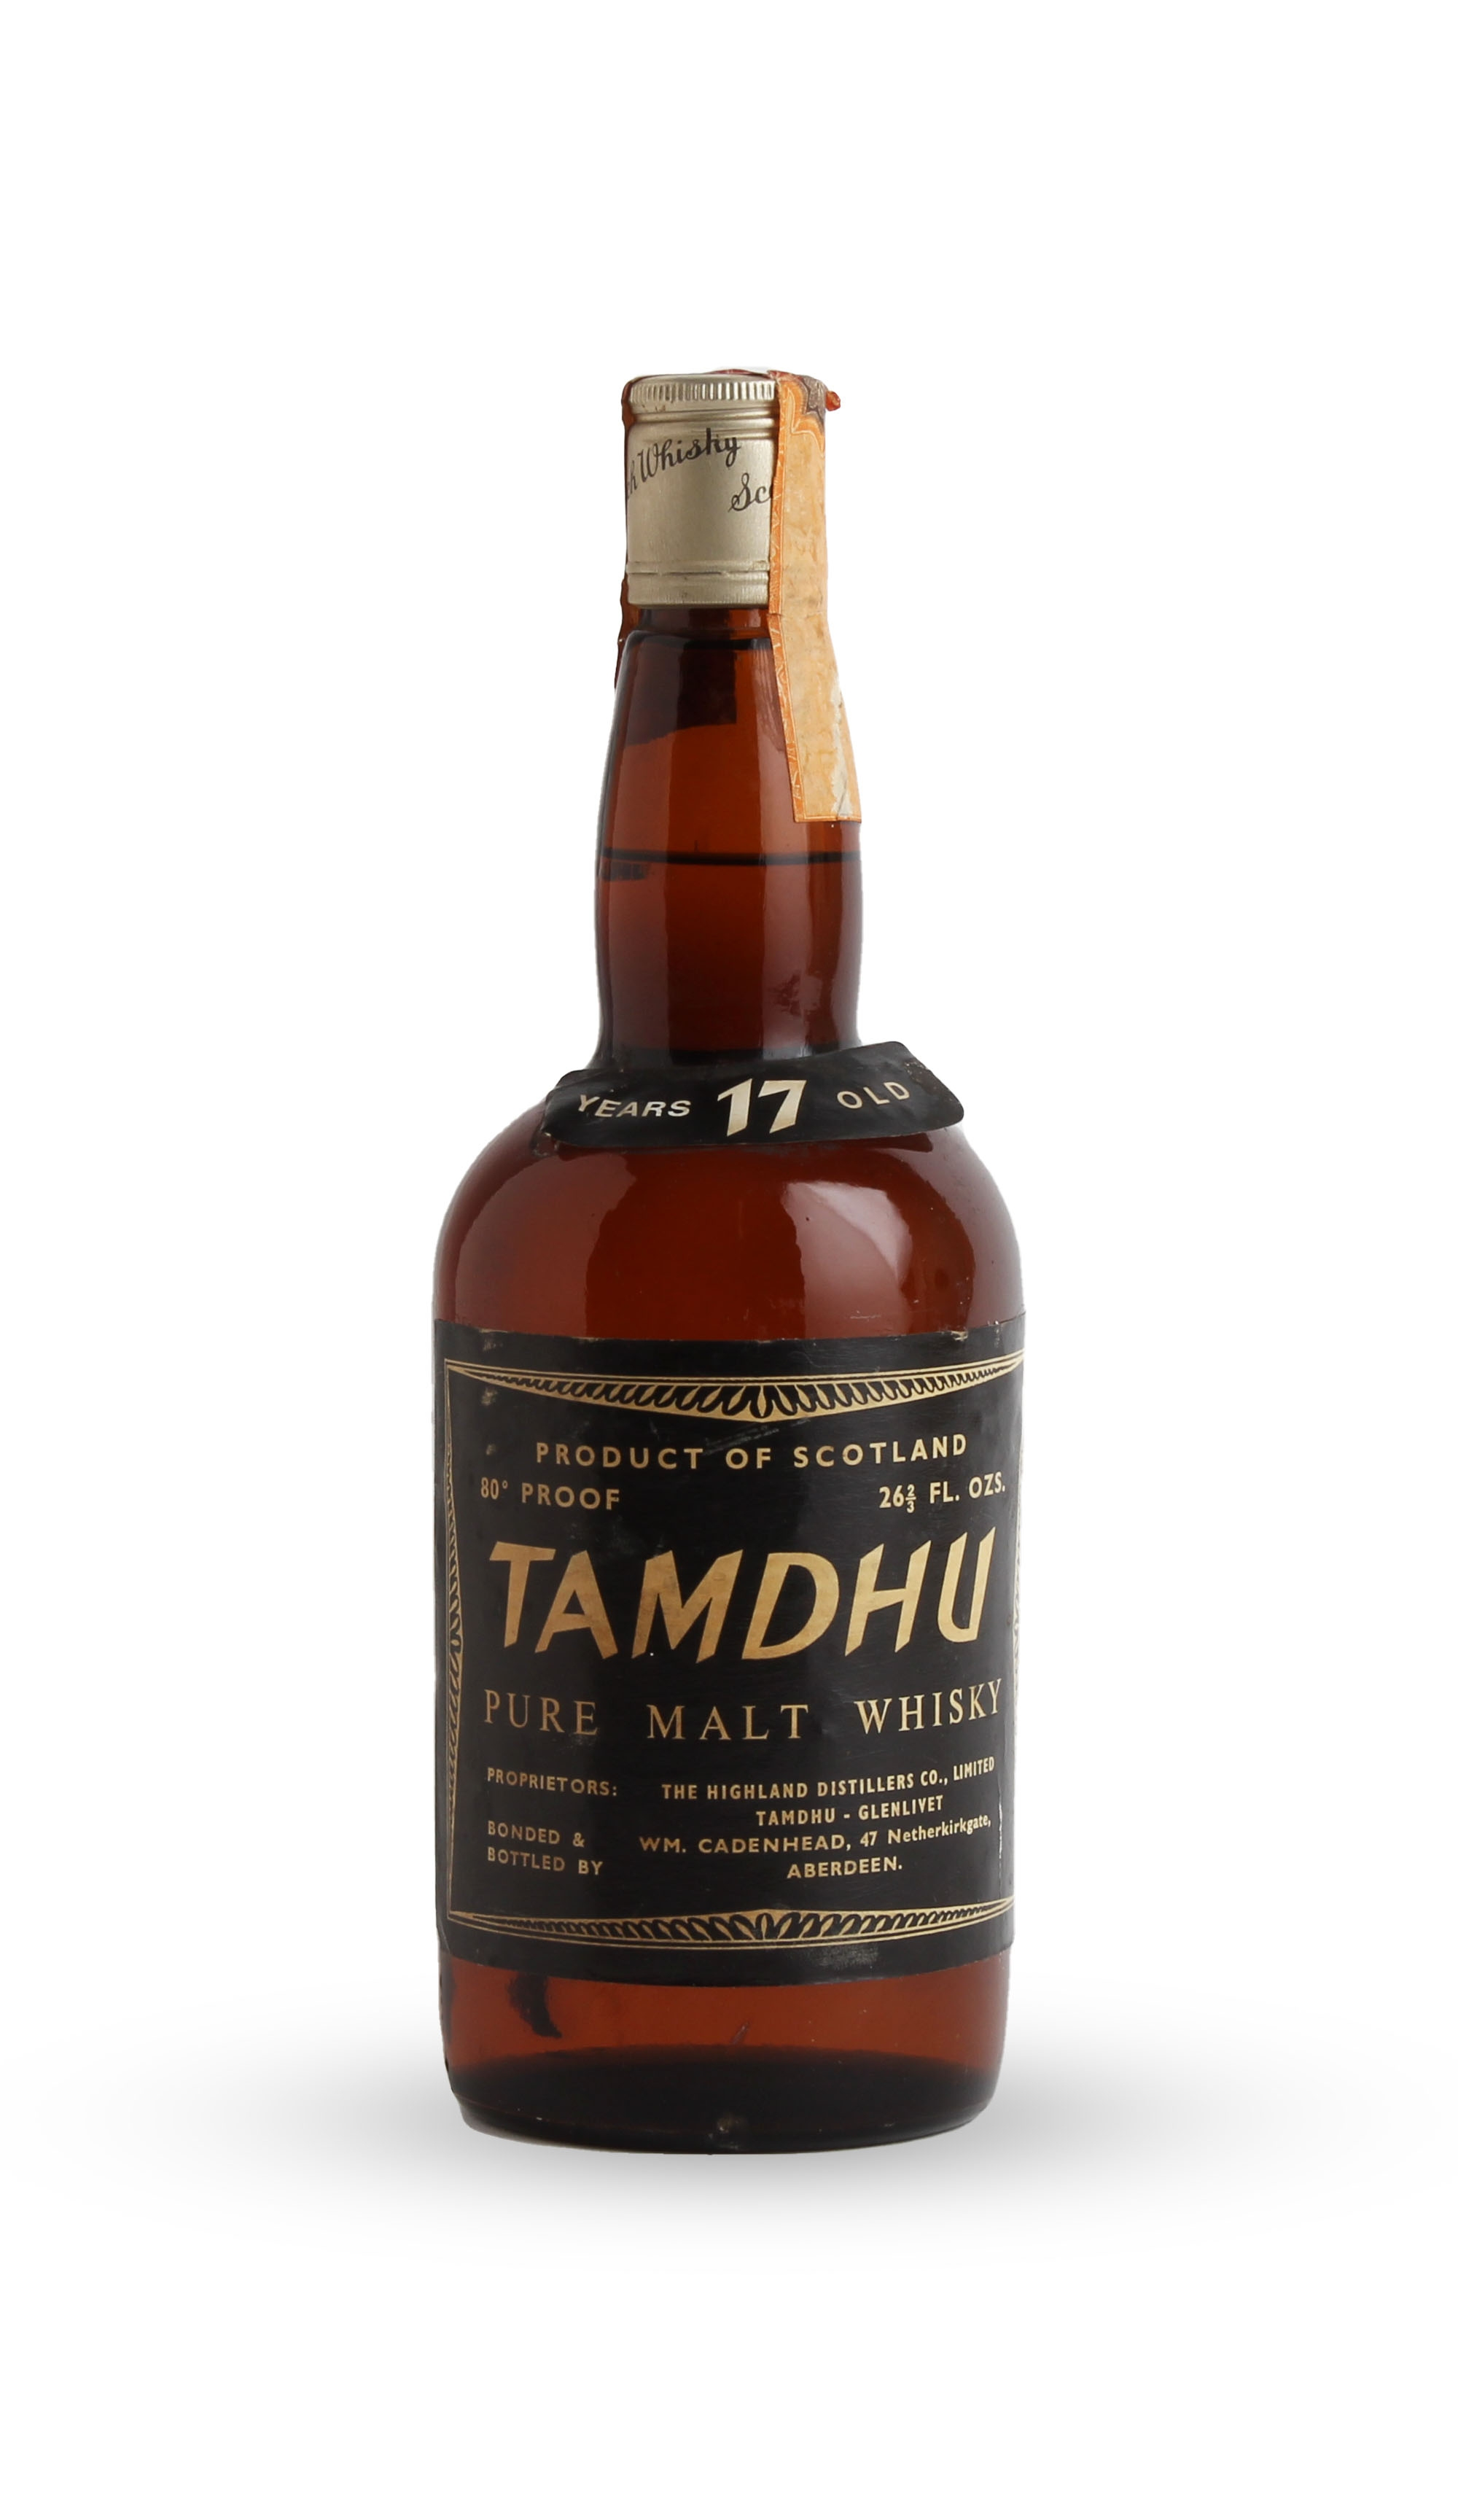 Tamdhu-17 years old